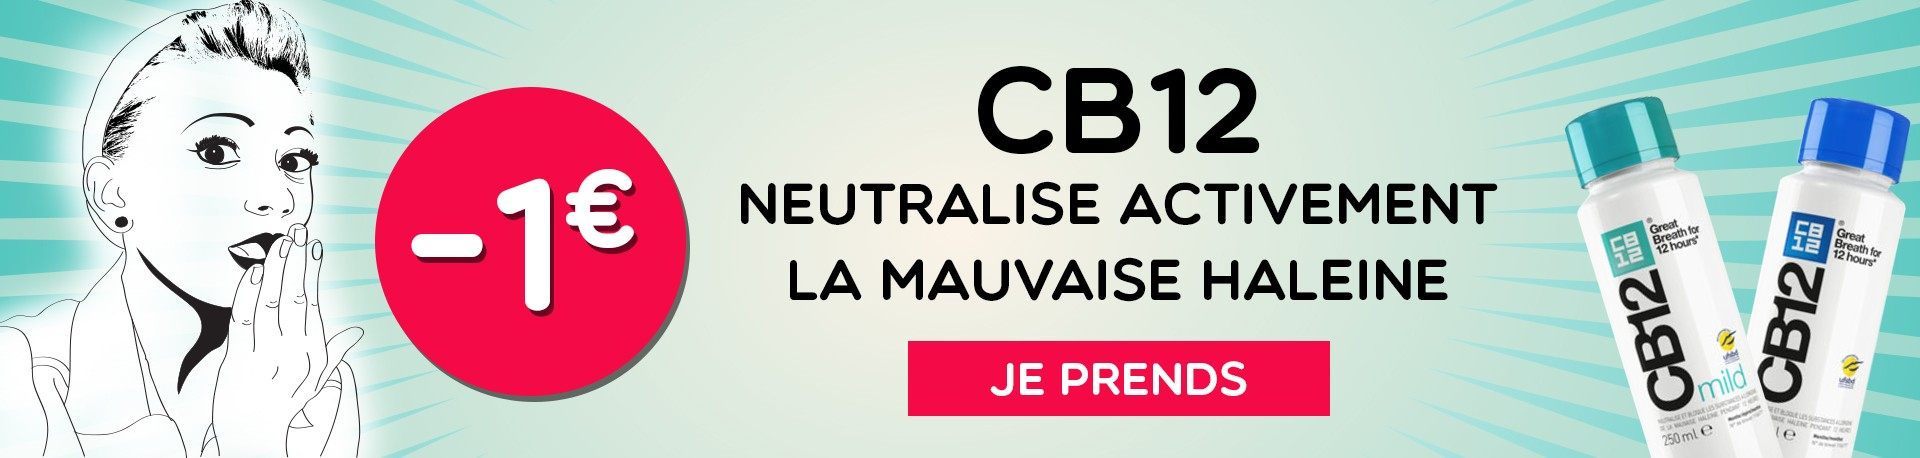 CB12 Juin 2018